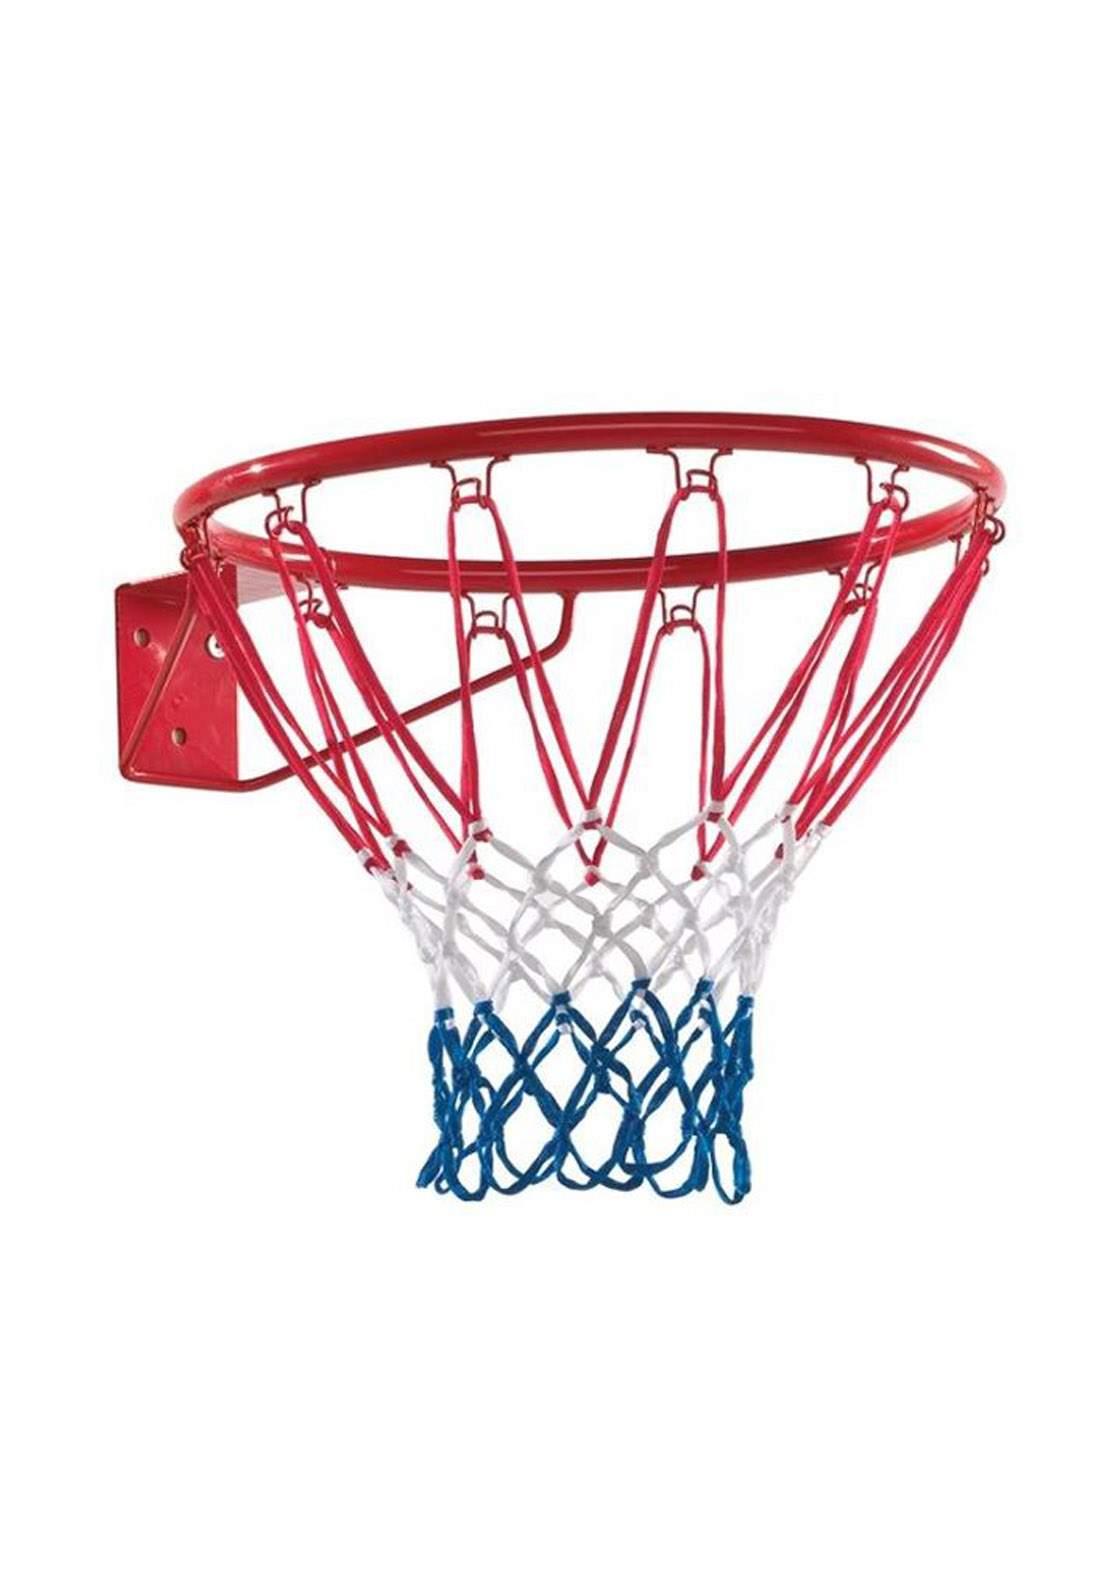 Rang basket رنج سلة مع شبك